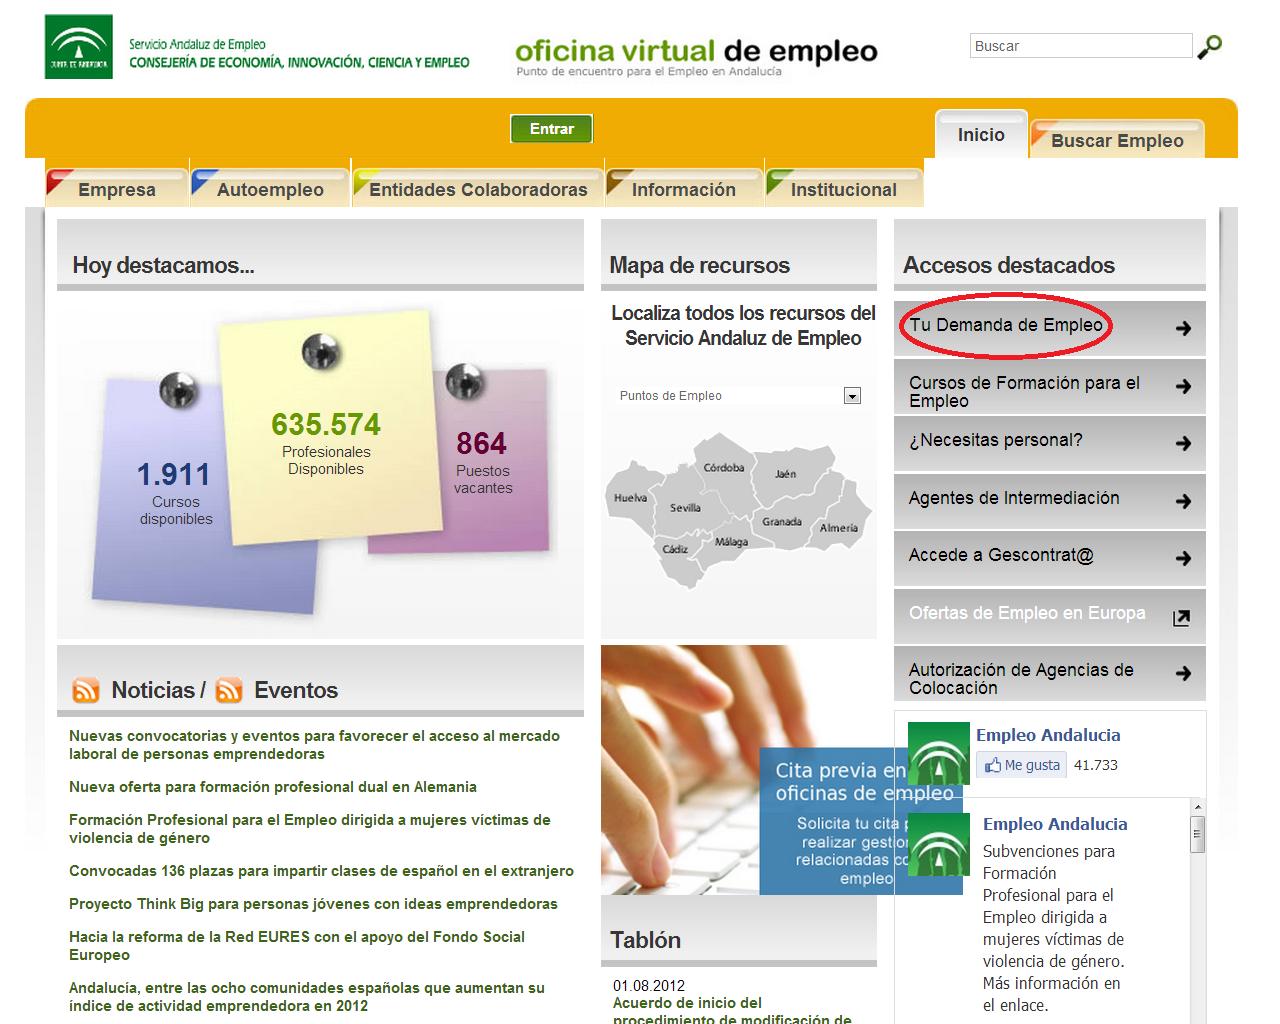 Orienta sue pasos a seguir para renovar la demanda de for Oficina de empleo andalucia